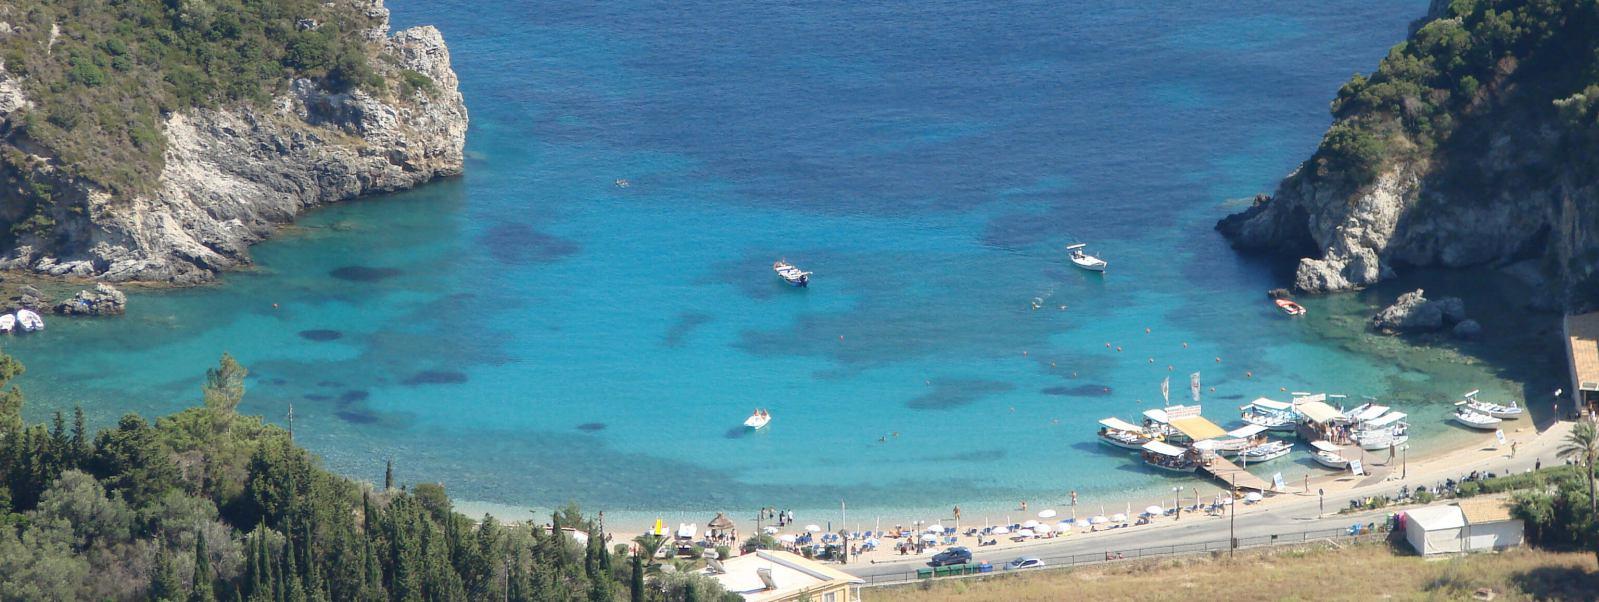 agios spyridon beach paleokastritsa